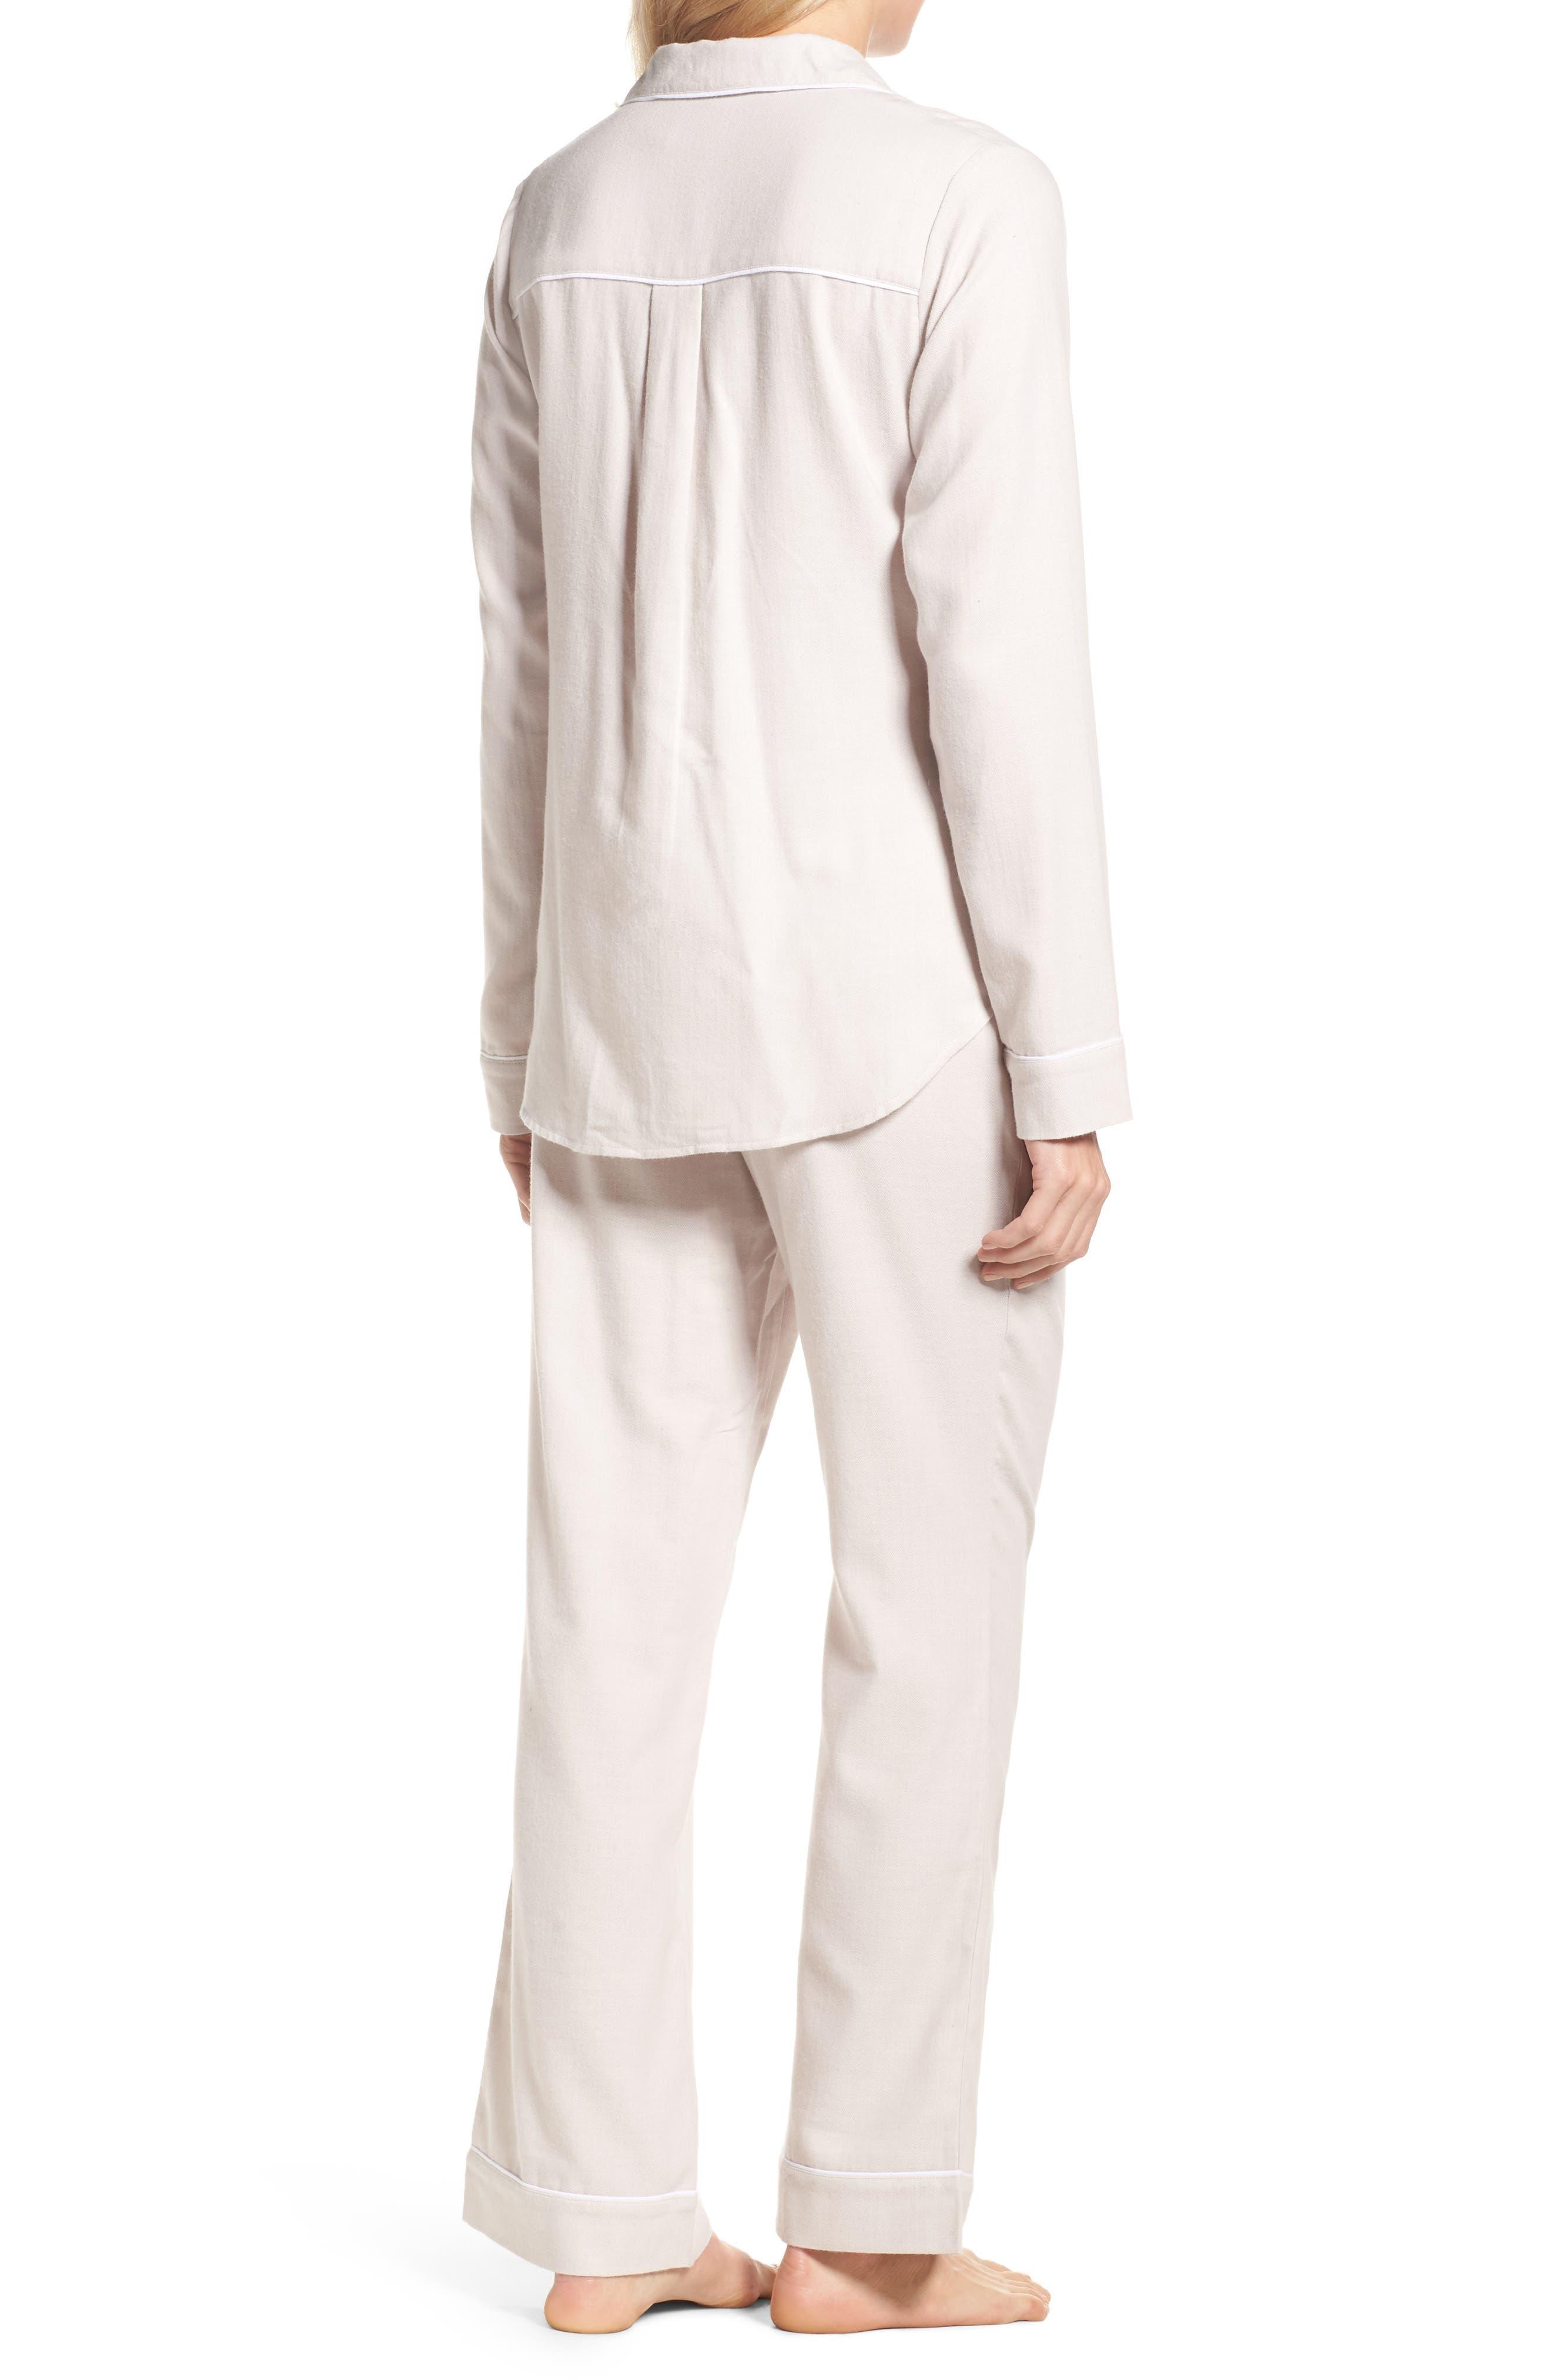 Raven Herringbone Pajamas,                             Alternate thumbnail 2, color,                             Ivory